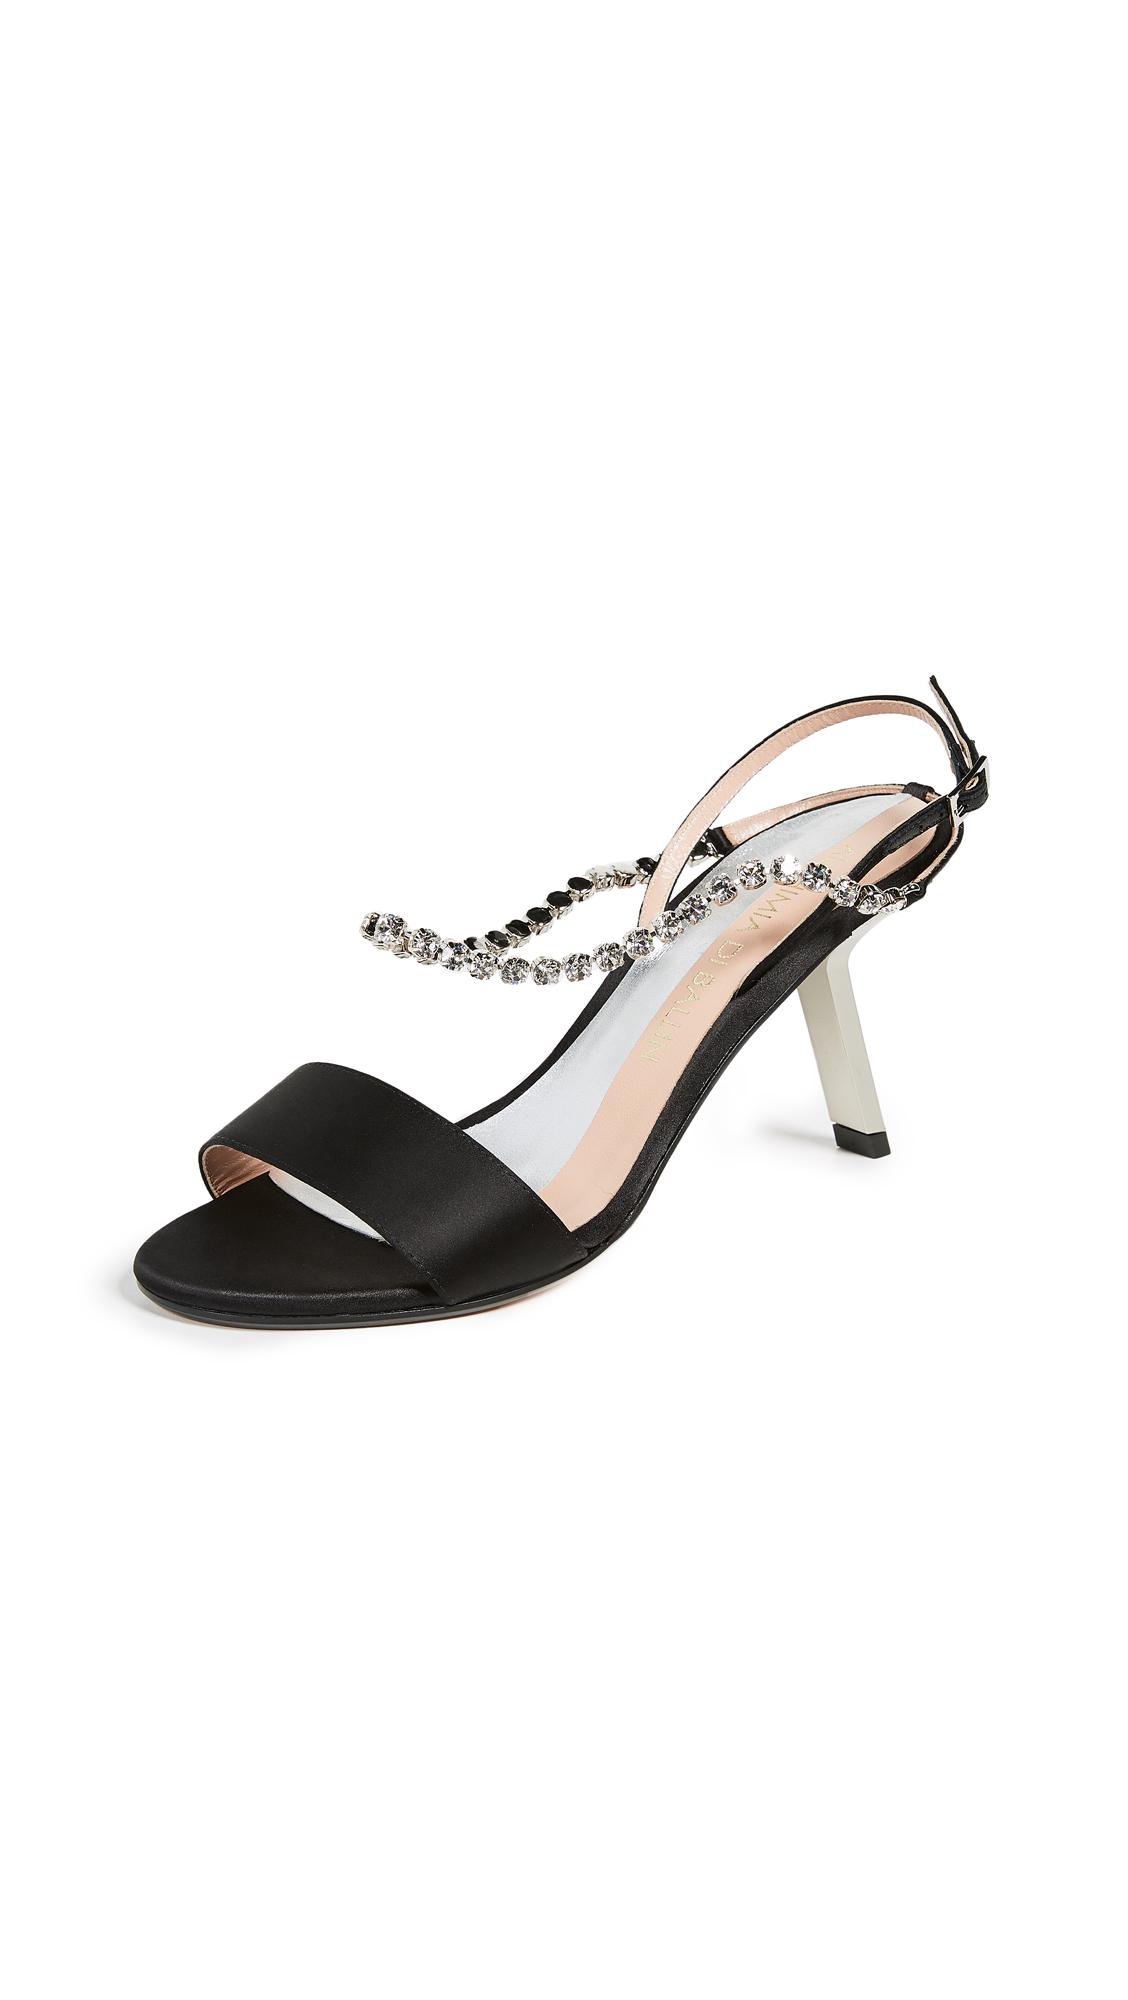 Alchimia di Ballin Satin Strass Sandals - Black